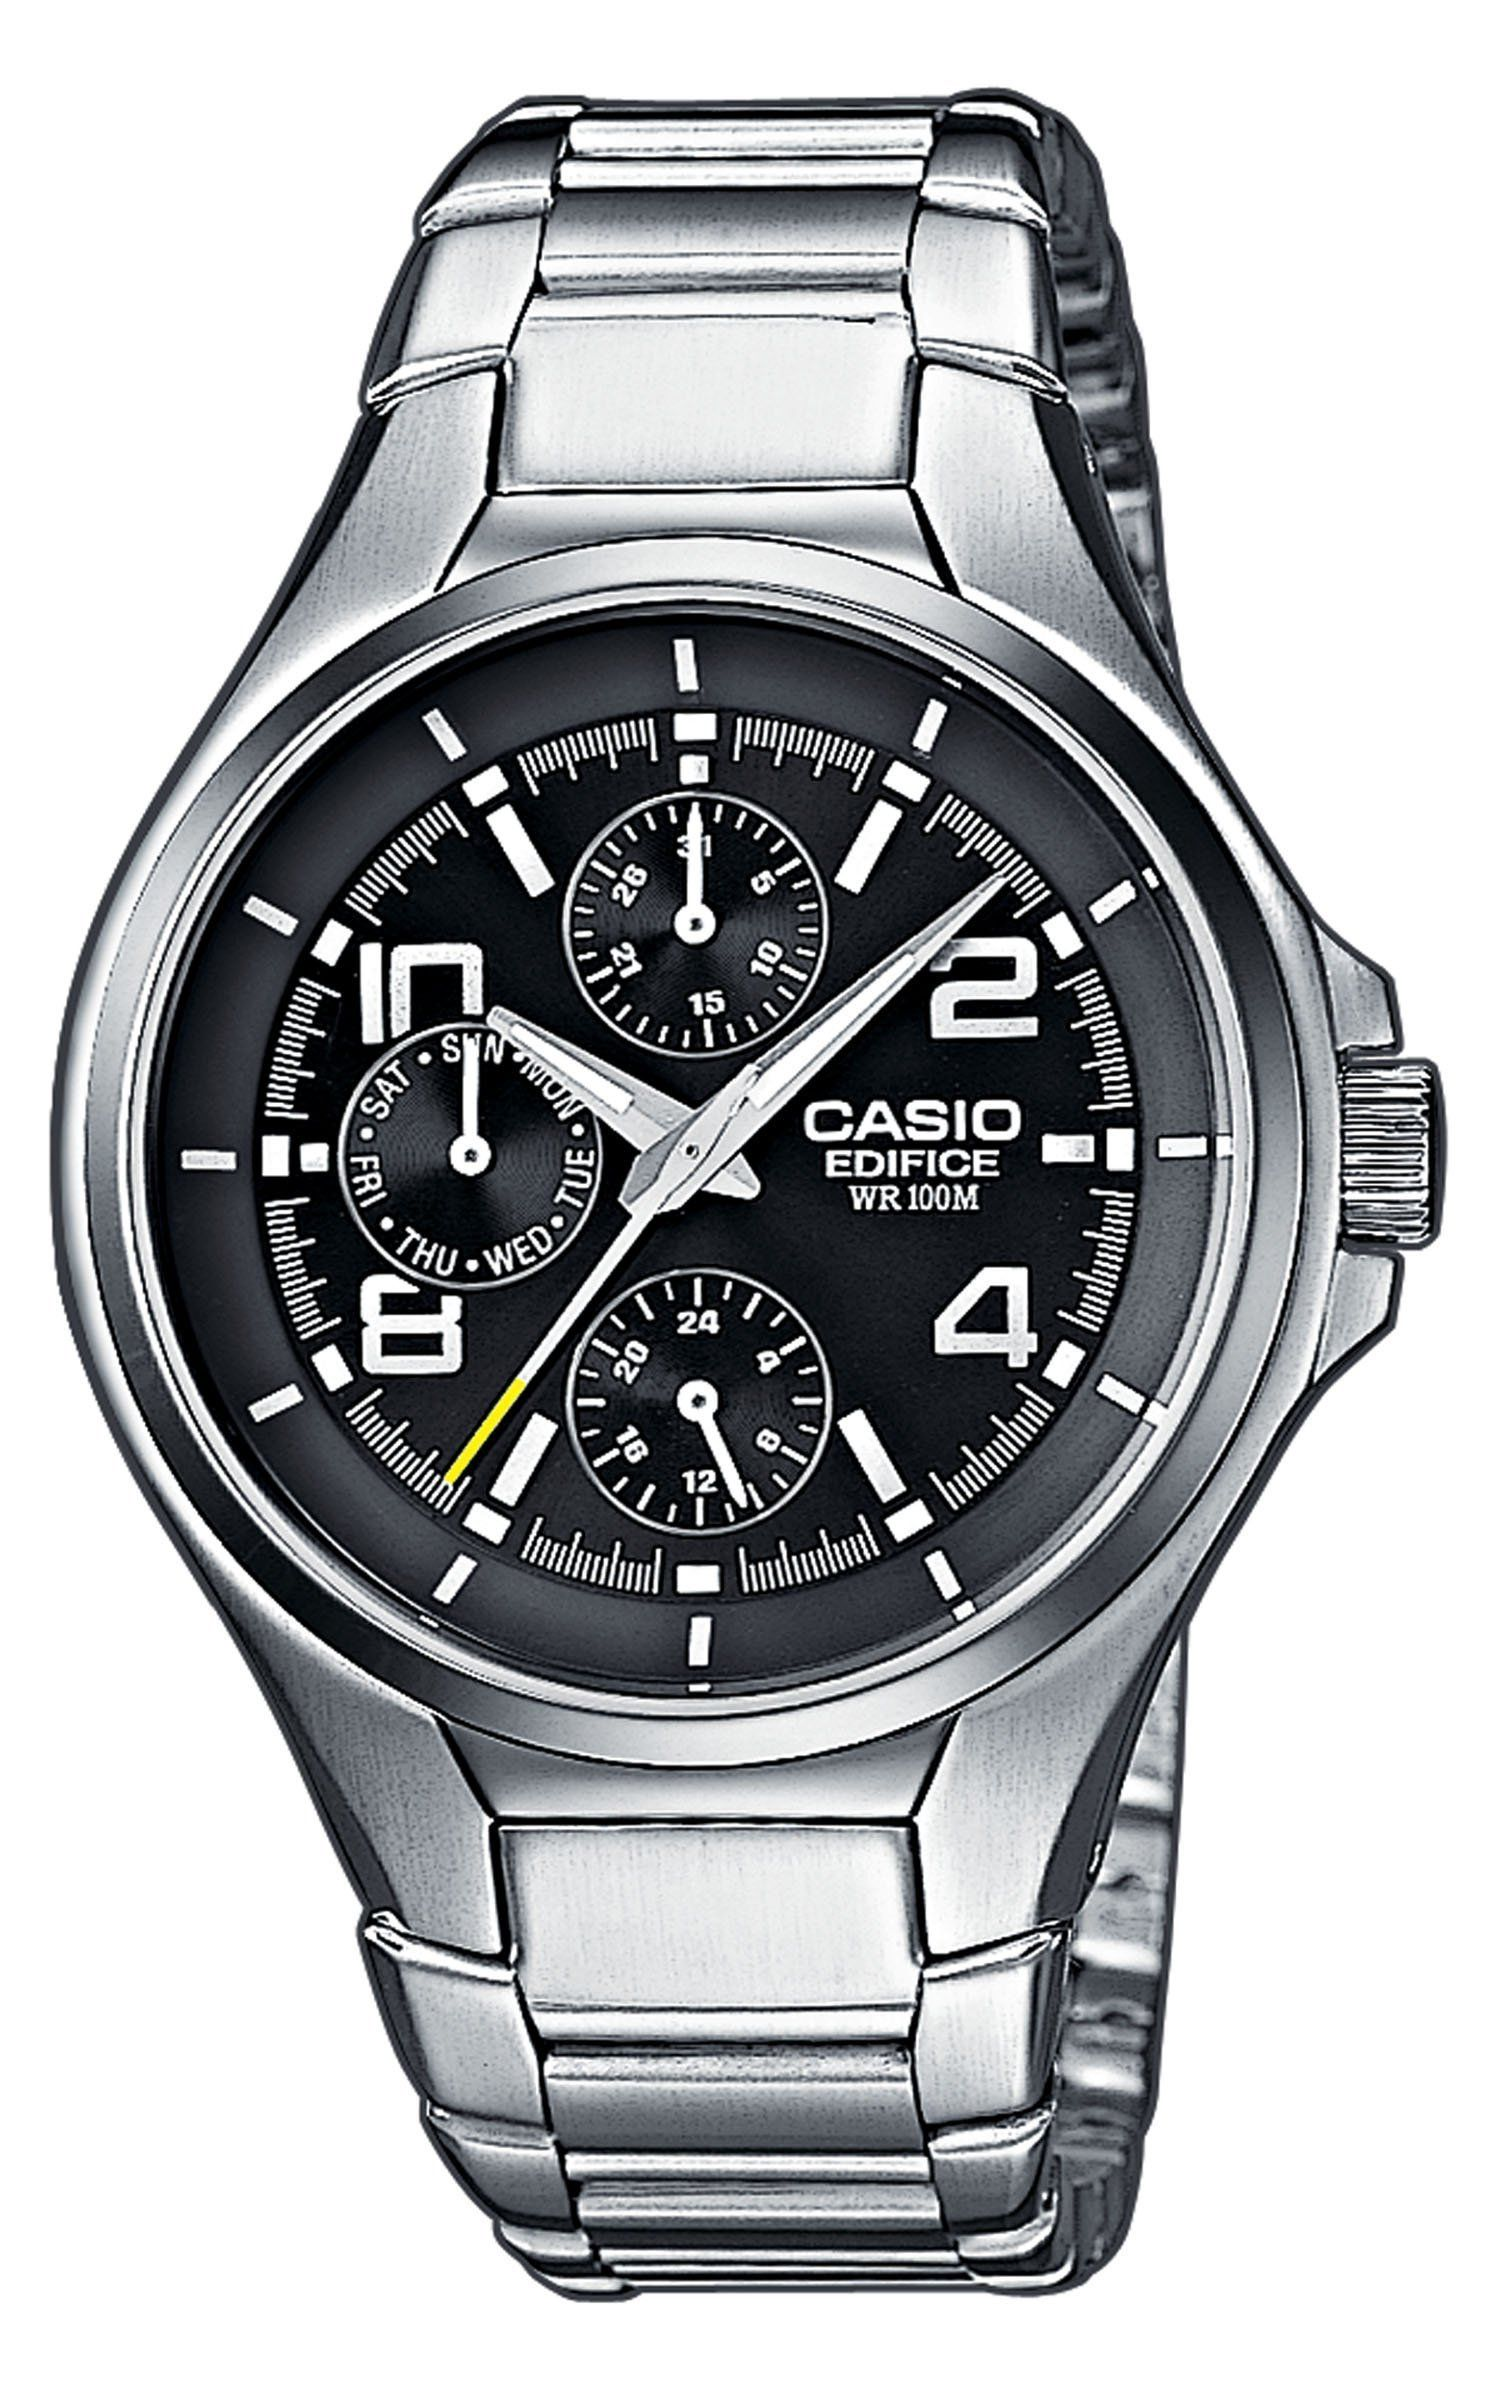 829f610380f6 CASIO EF-316D-1AVEF Edifice - Reloj de caballero de cuarzo